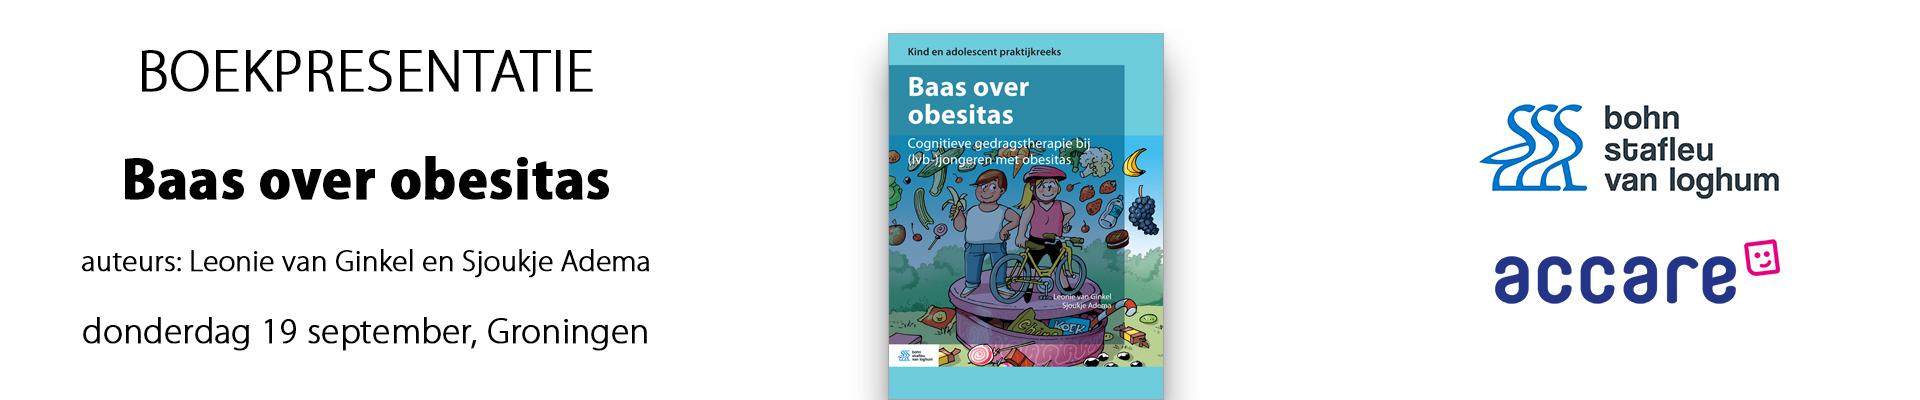 Boekpresentatie 'Protocol Baas over Obesitas'